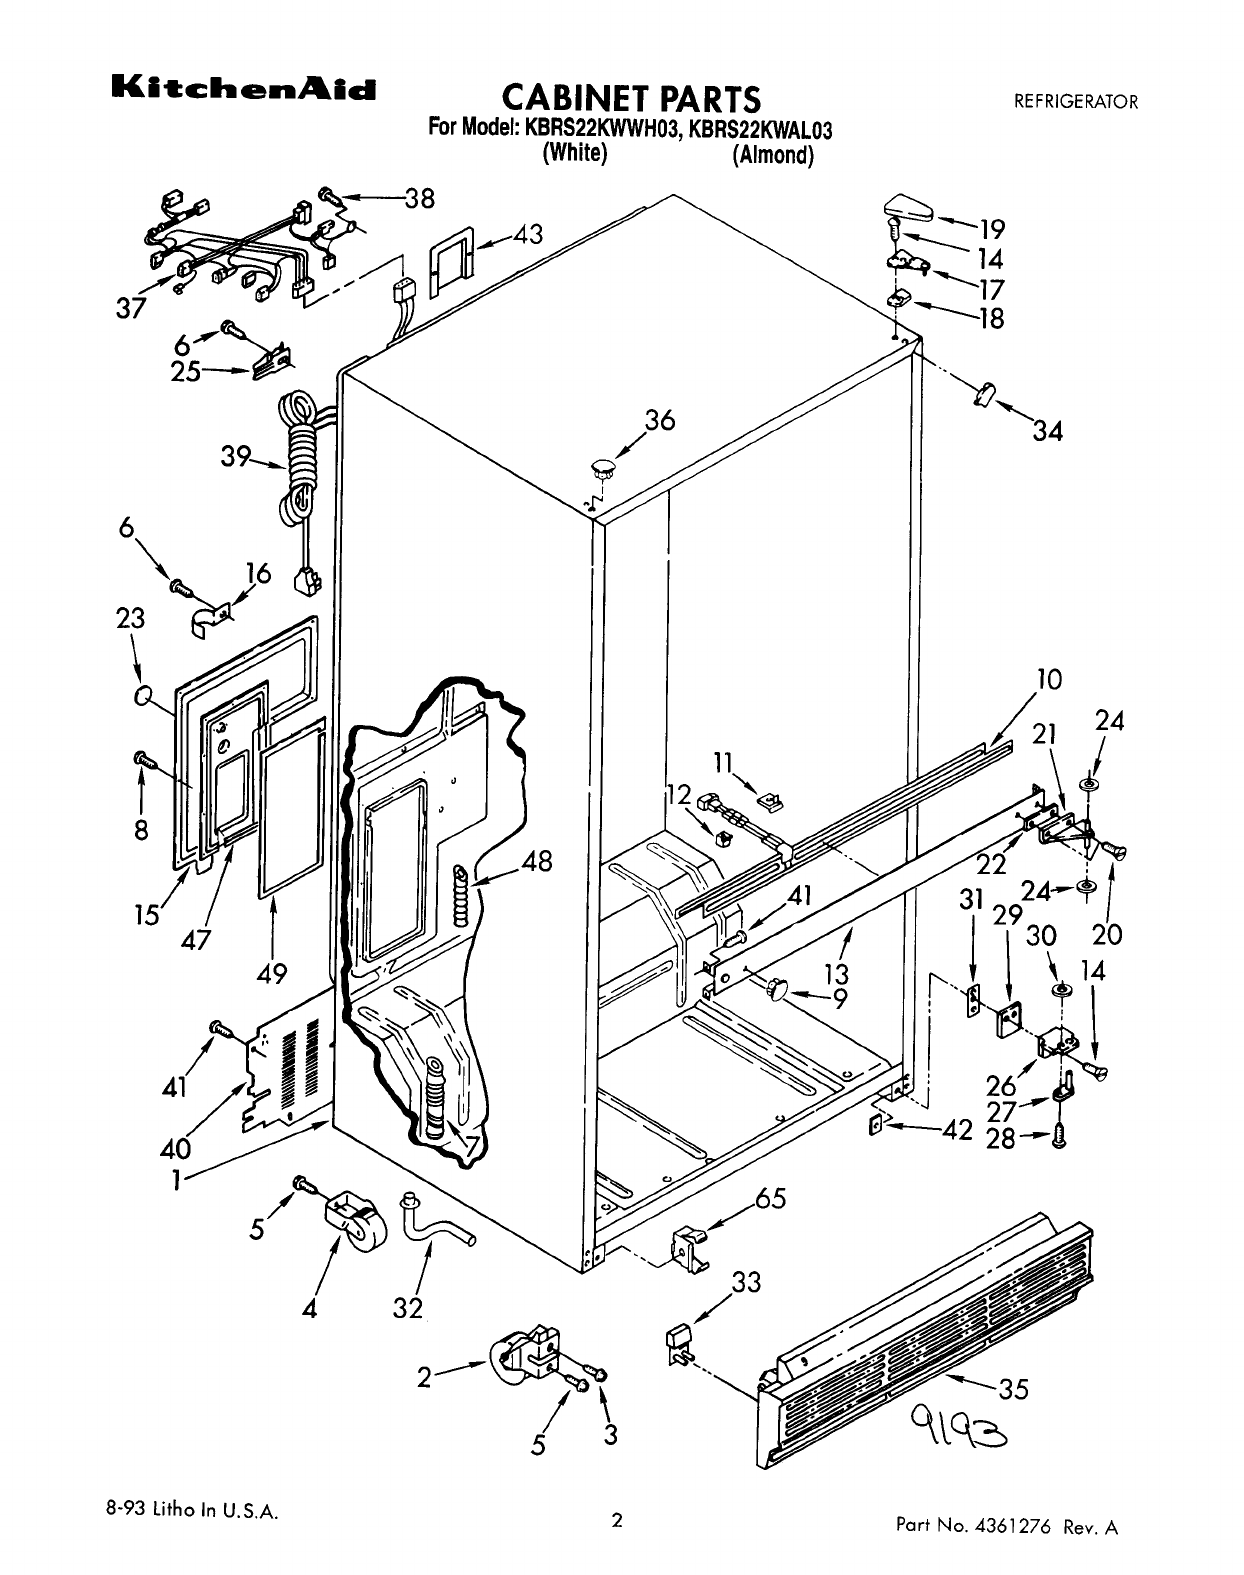 Perfect Kitchenaid Superba Refrigerator Repair Manual And View Kitchenaid Refrigerator Refrigerator Repair Refrigerator Parts